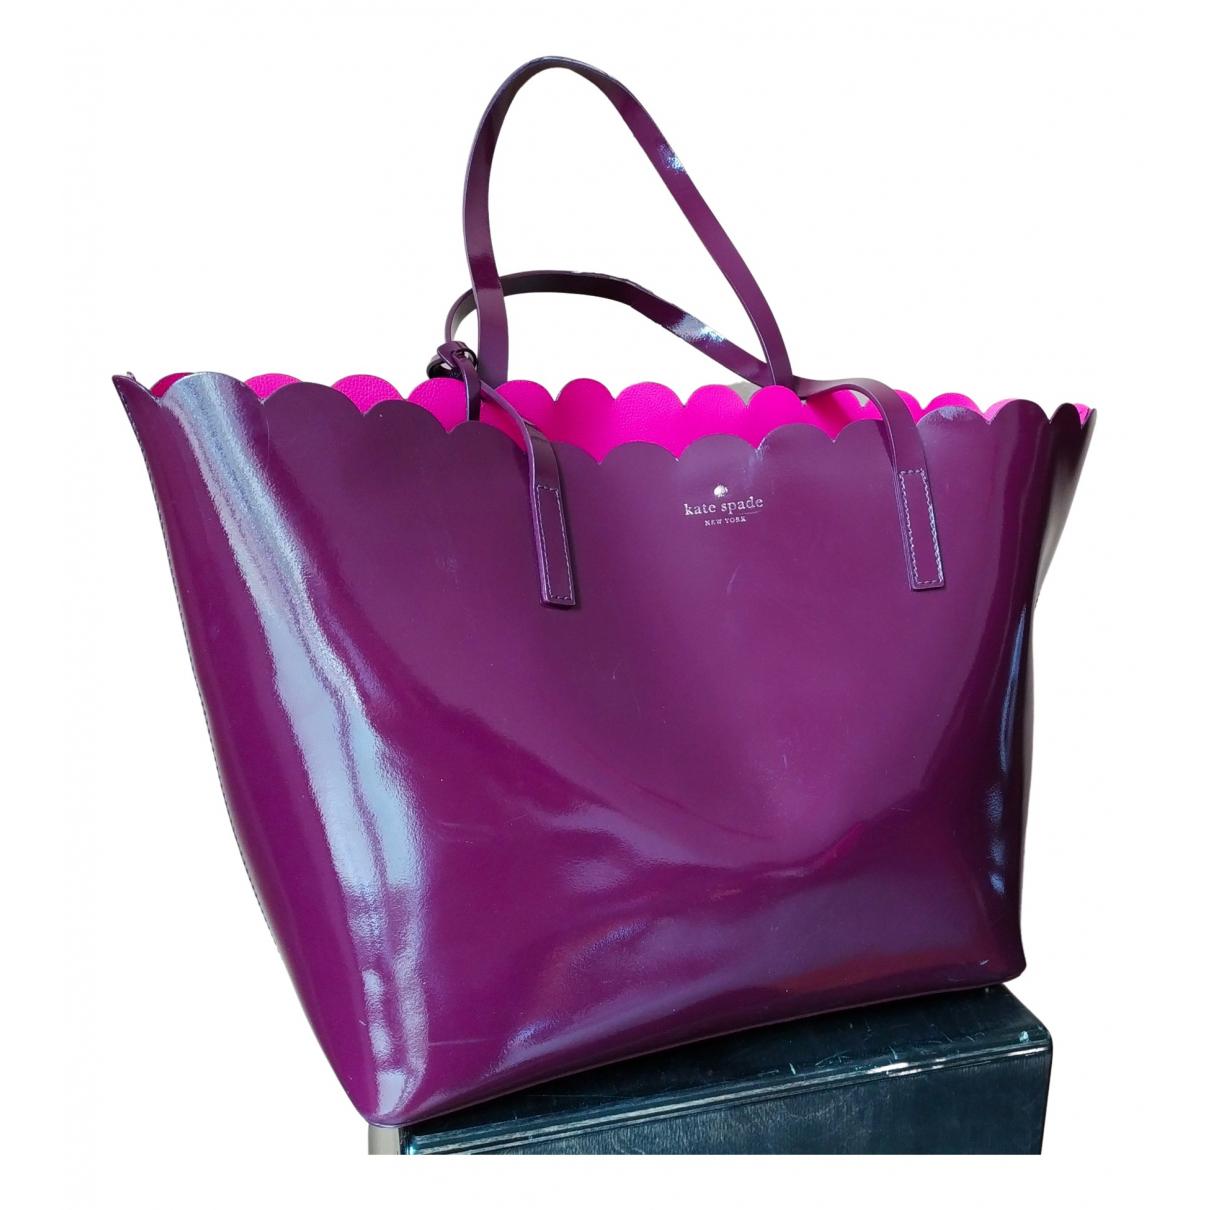 Kate Spade \N Purple Patent leather handbag for Women \N